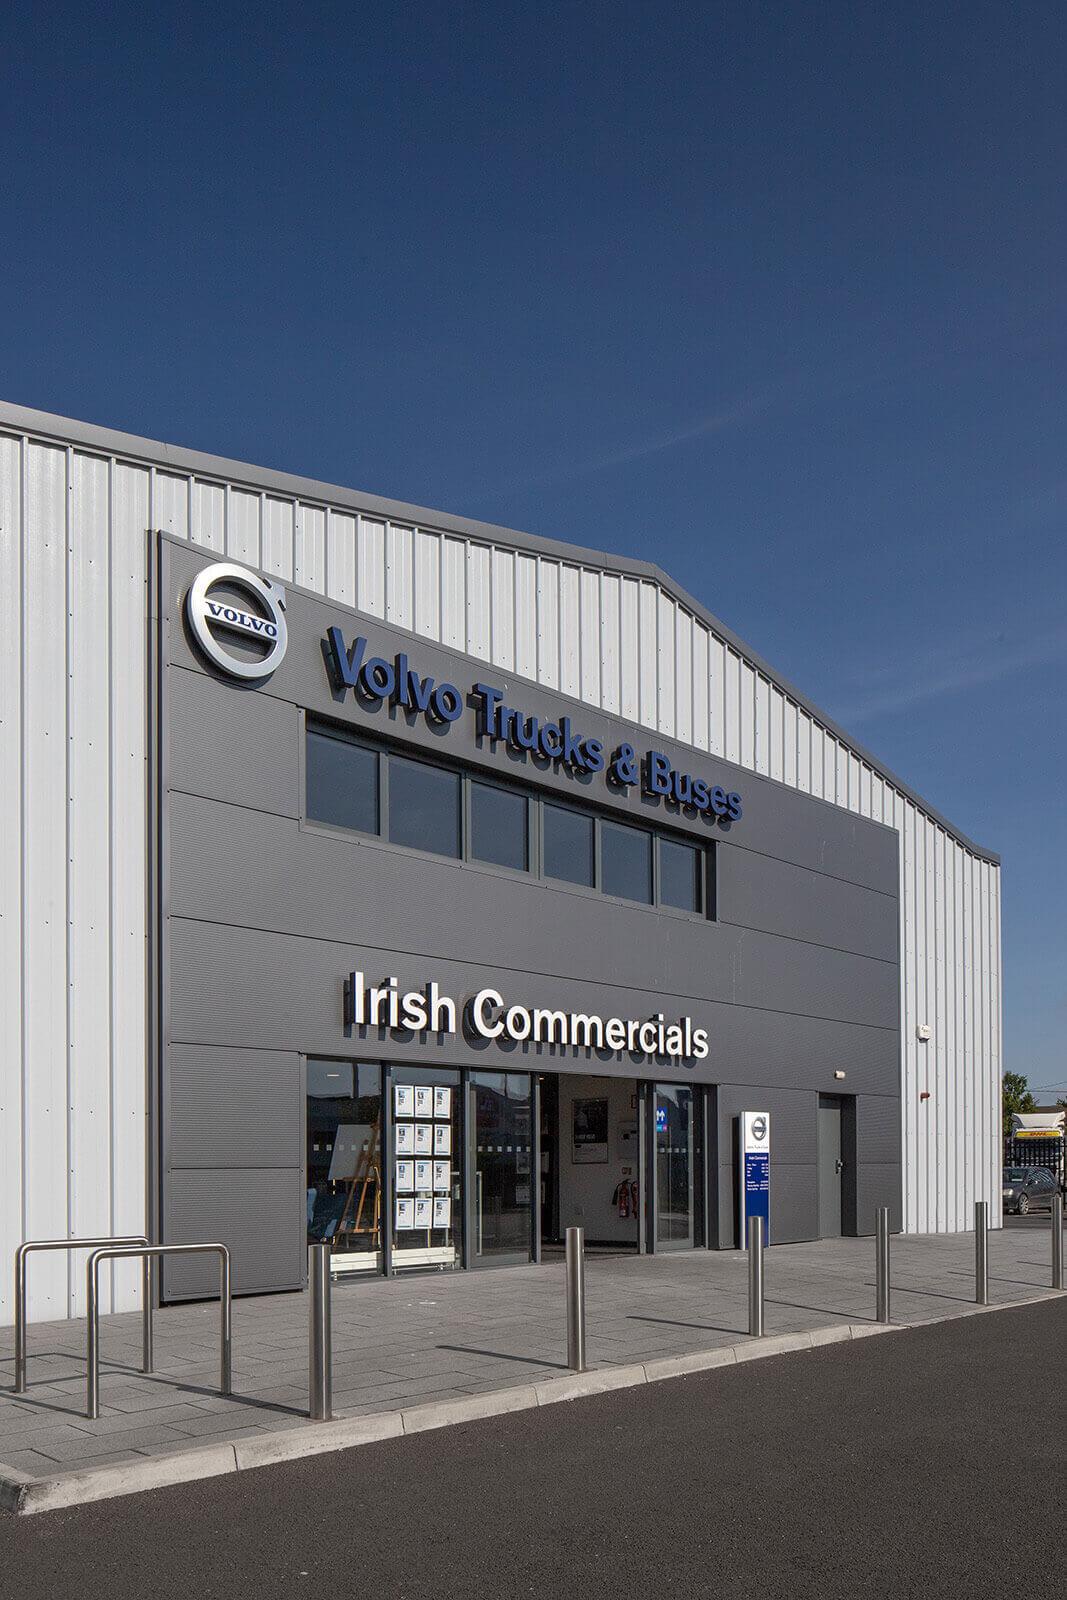 02 08 2019 Abode Irish Commercials 003 High Resolution